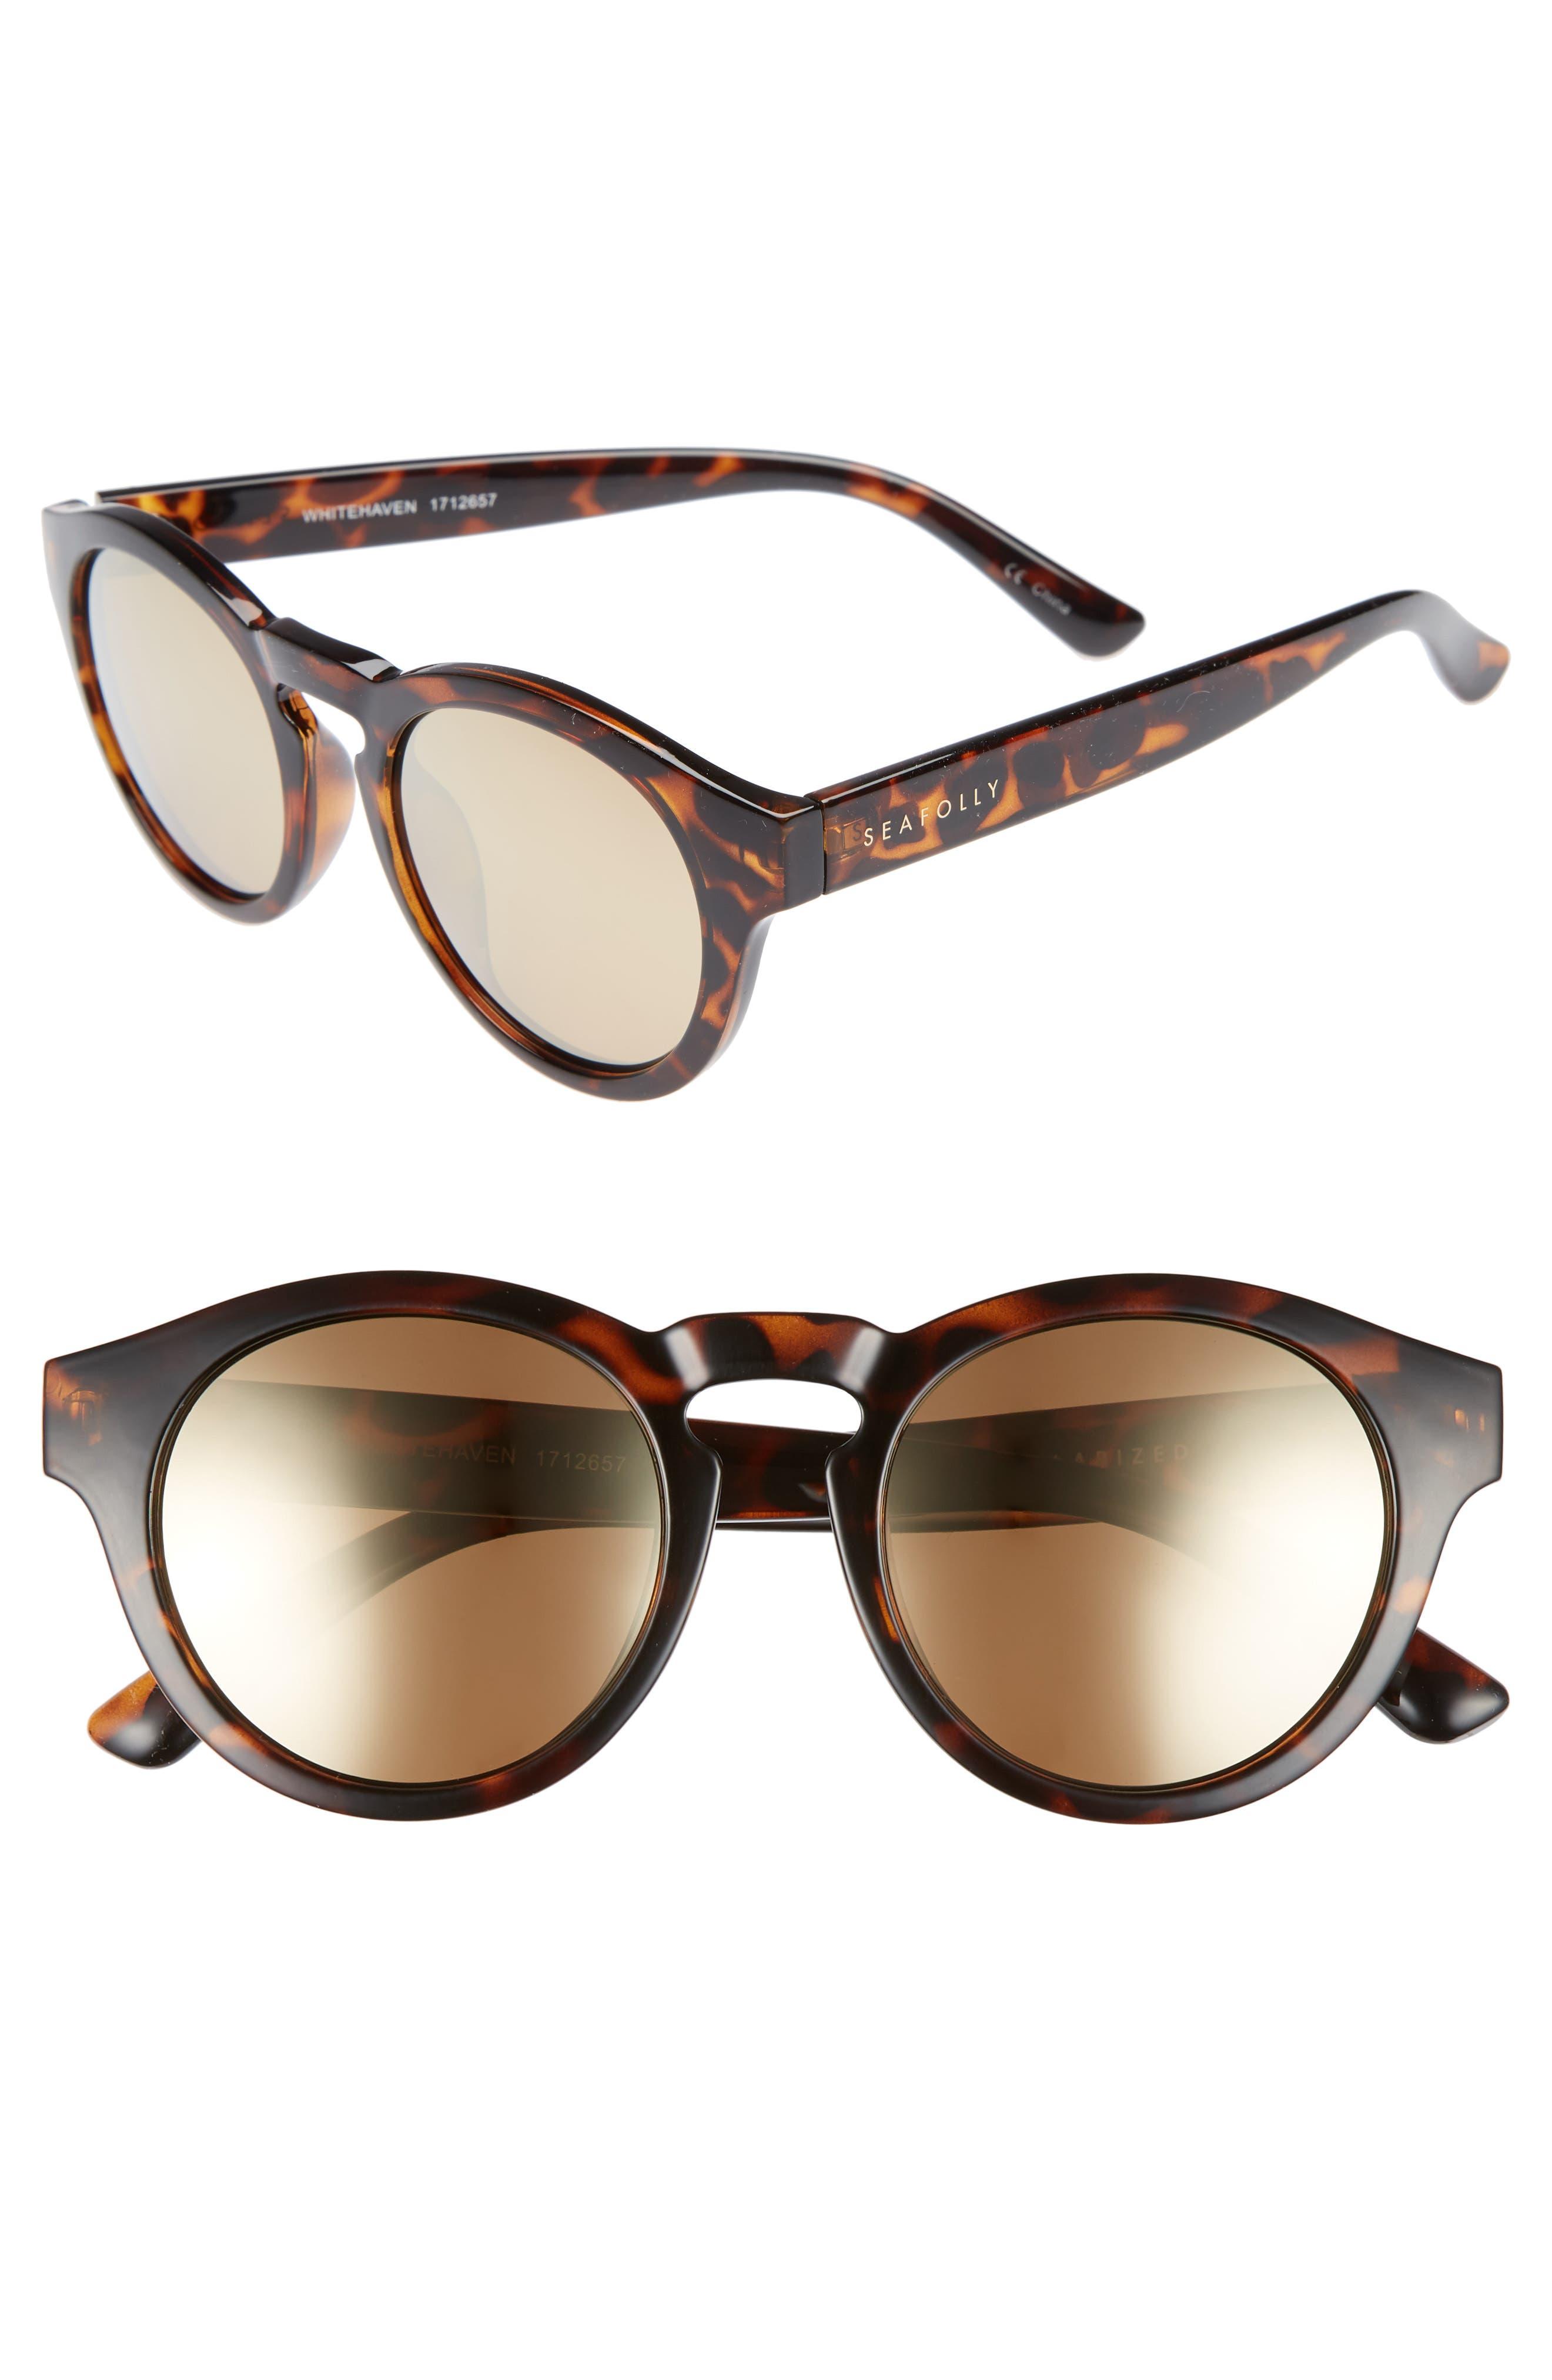 Whitehaven 49mm Round Lens Polarized Sunglasses,                         Main,                         color, DARK TORT